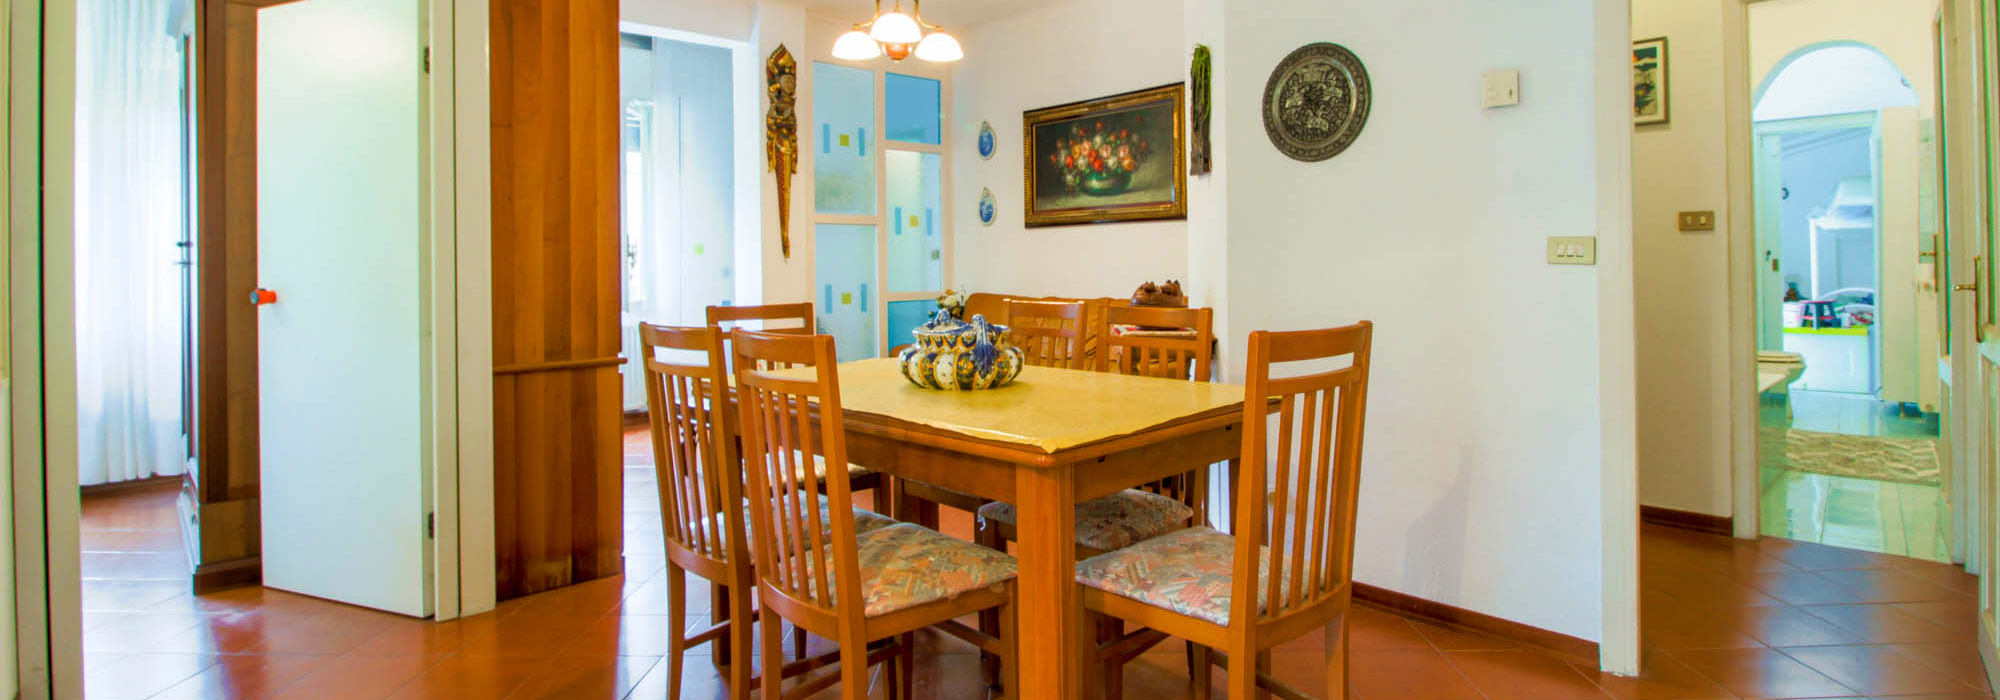 Sanremo vendita appartamento in casa indipendente con grande garage